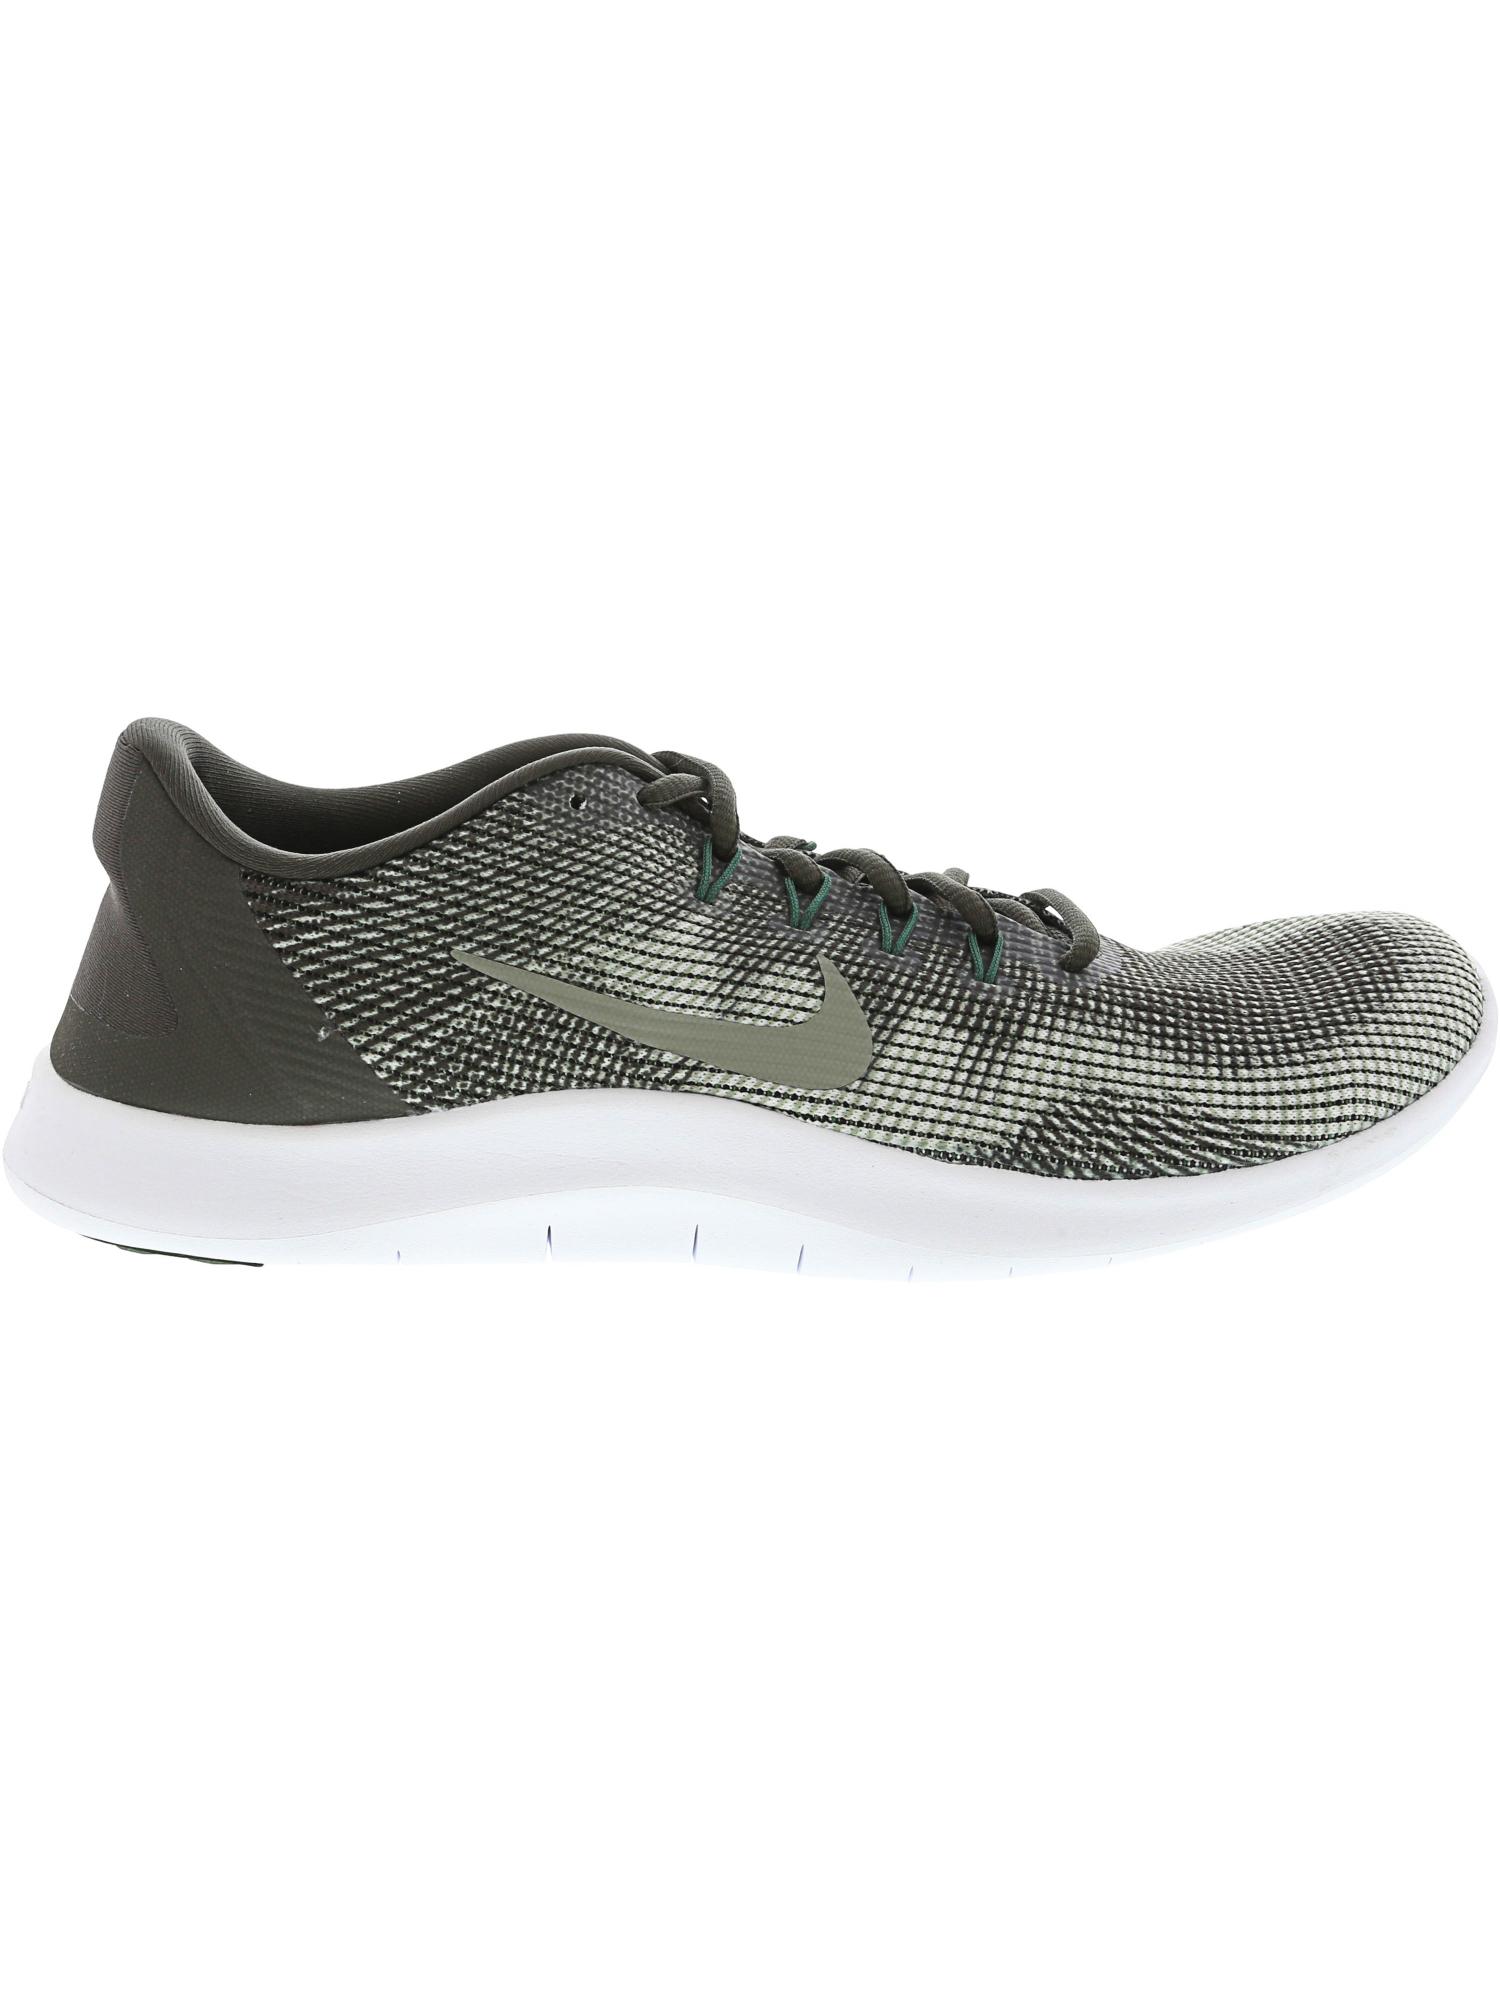 0d3b235cac3102 Nike Men s Flex 2018 Rn Ankle-High Mesh Running Shoe